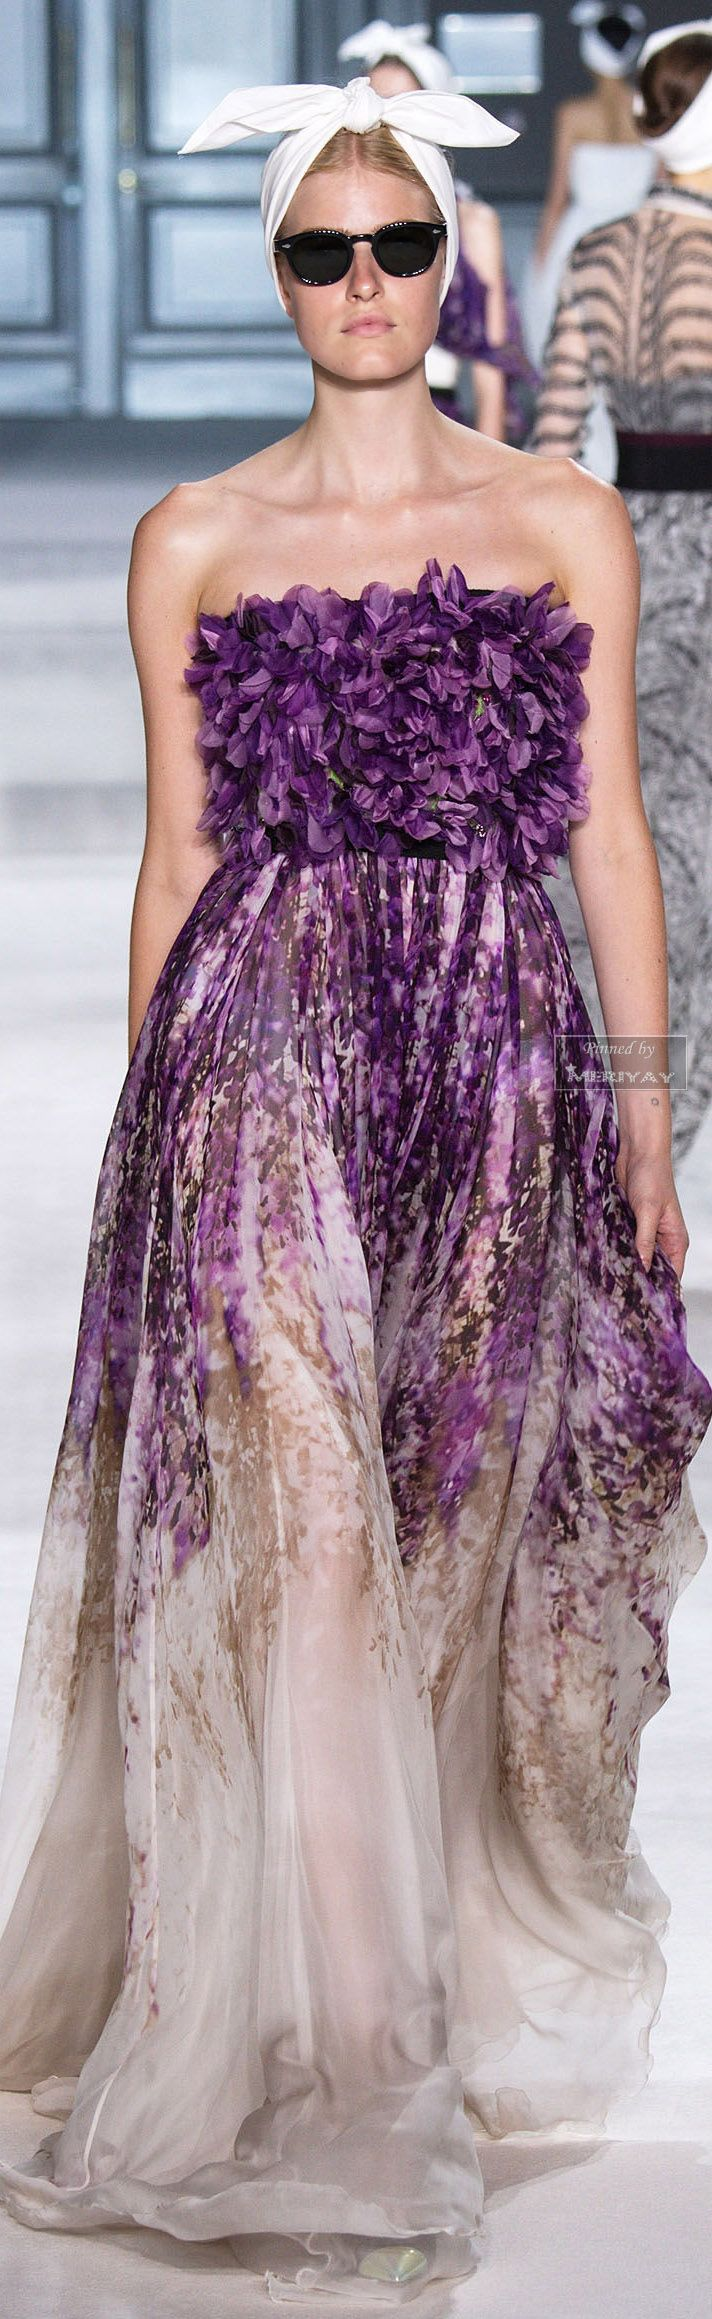 38 best dream dresses images on Pinterest | Party fashion, Evening ...